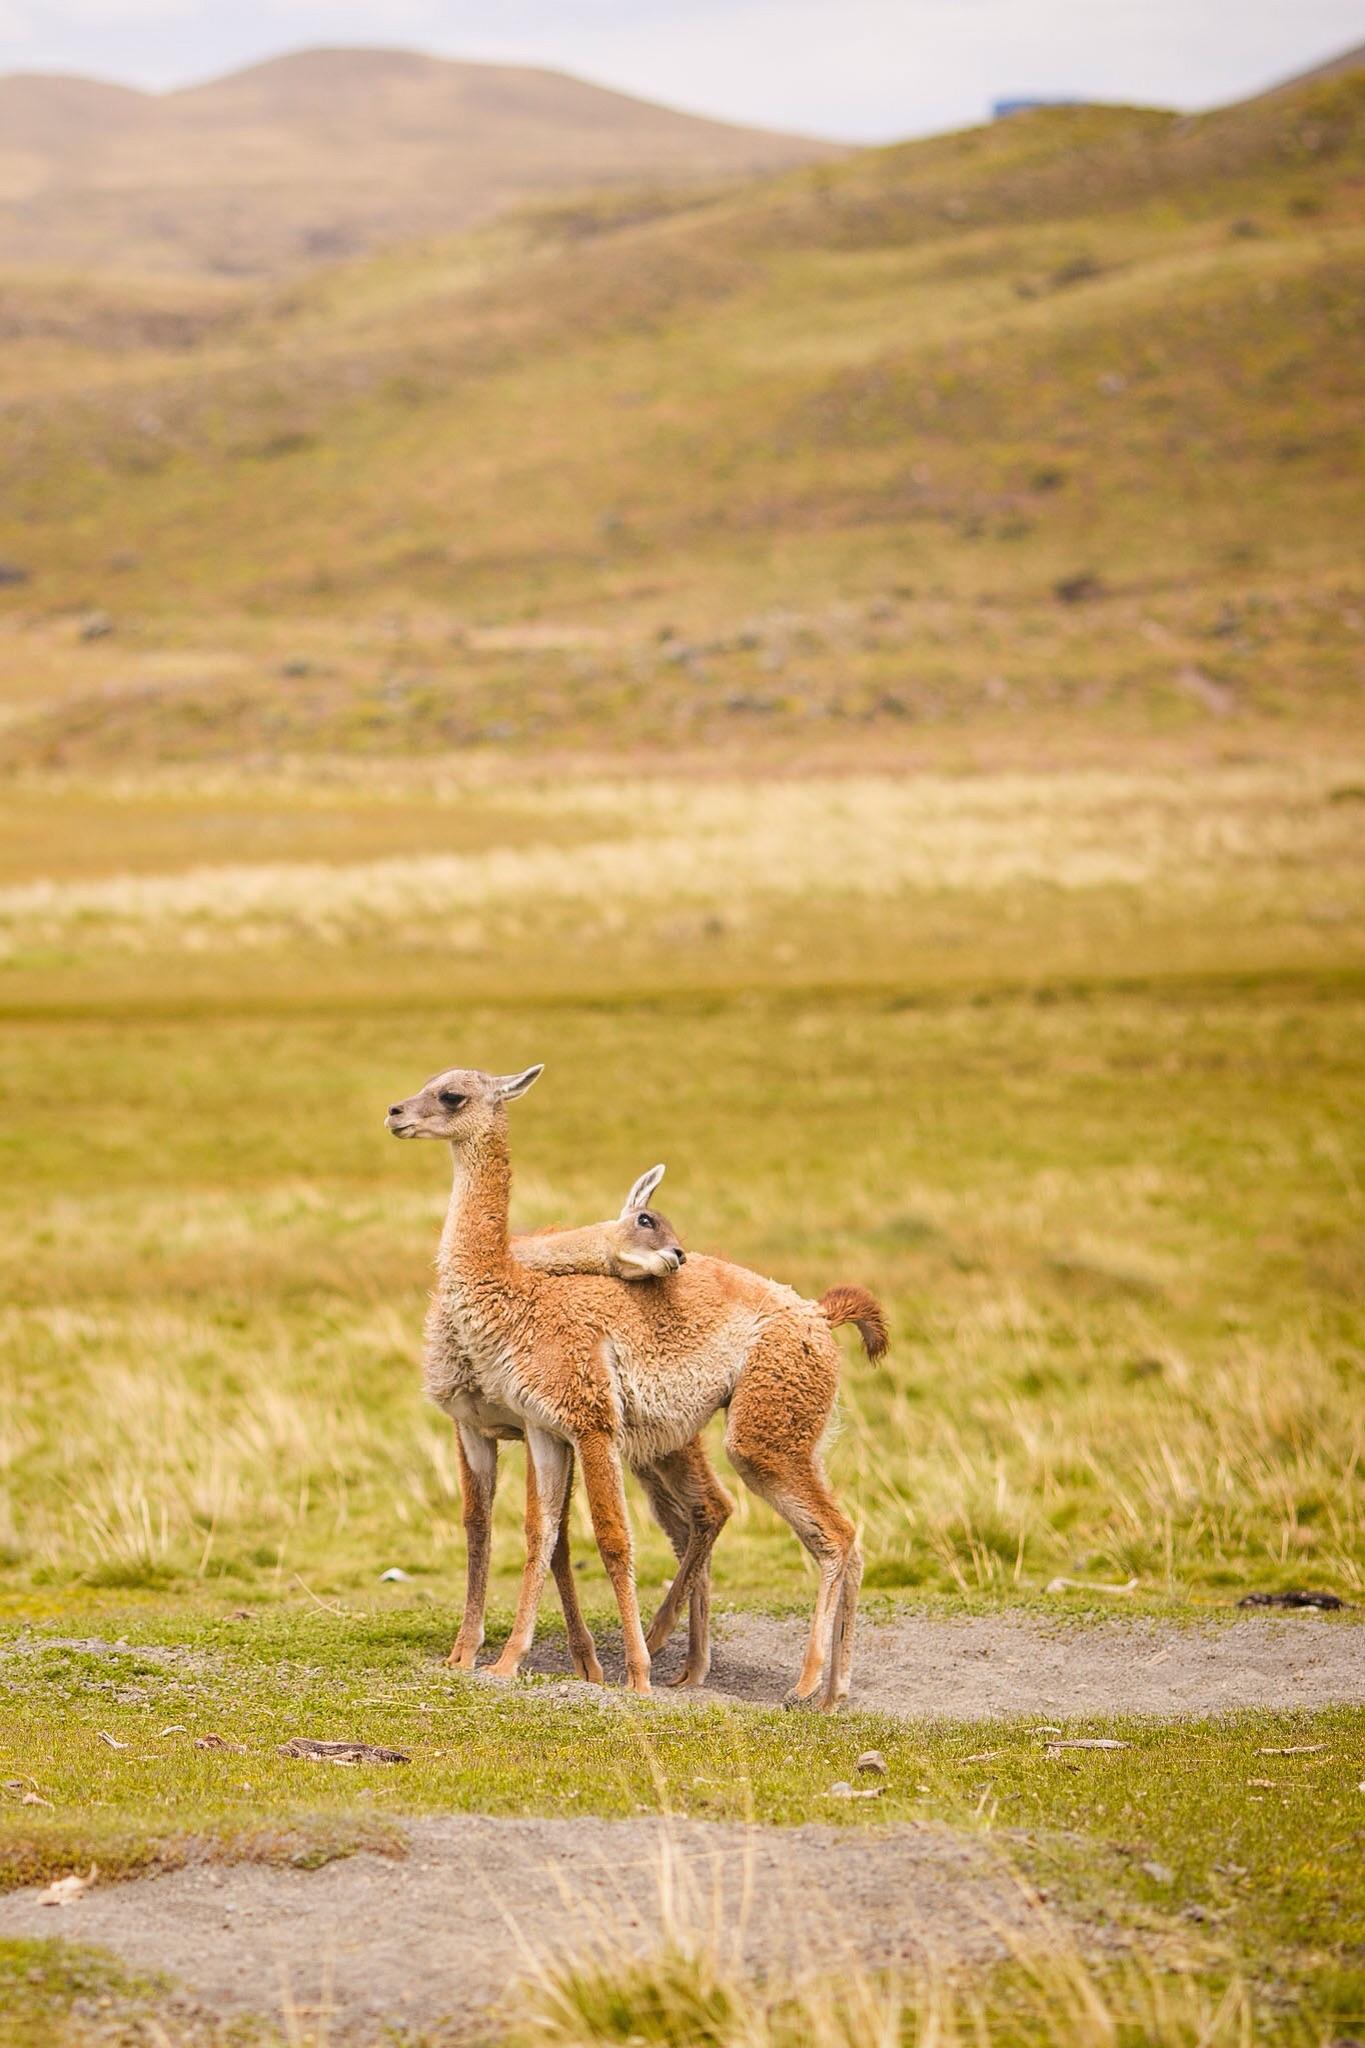 Wedding-Travellers-Overlanding-Destination-Wedding-Chile-Torres-del-Paine-cute-guanaco-llama-lama-baby